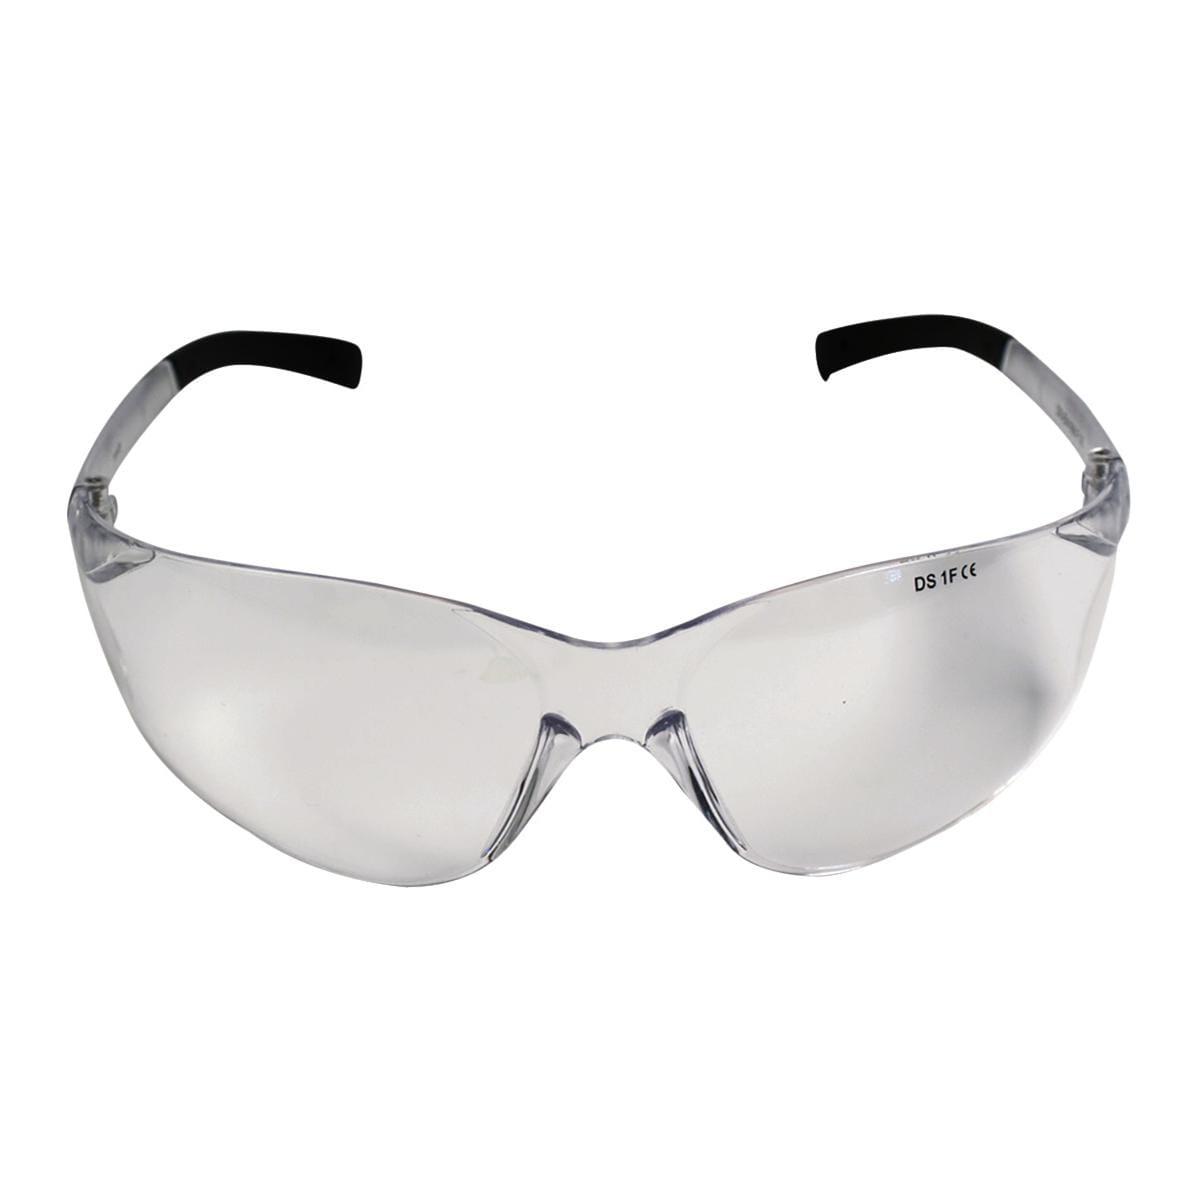 MINI AR Glasses | iF WORLD DESIGN GUIDE